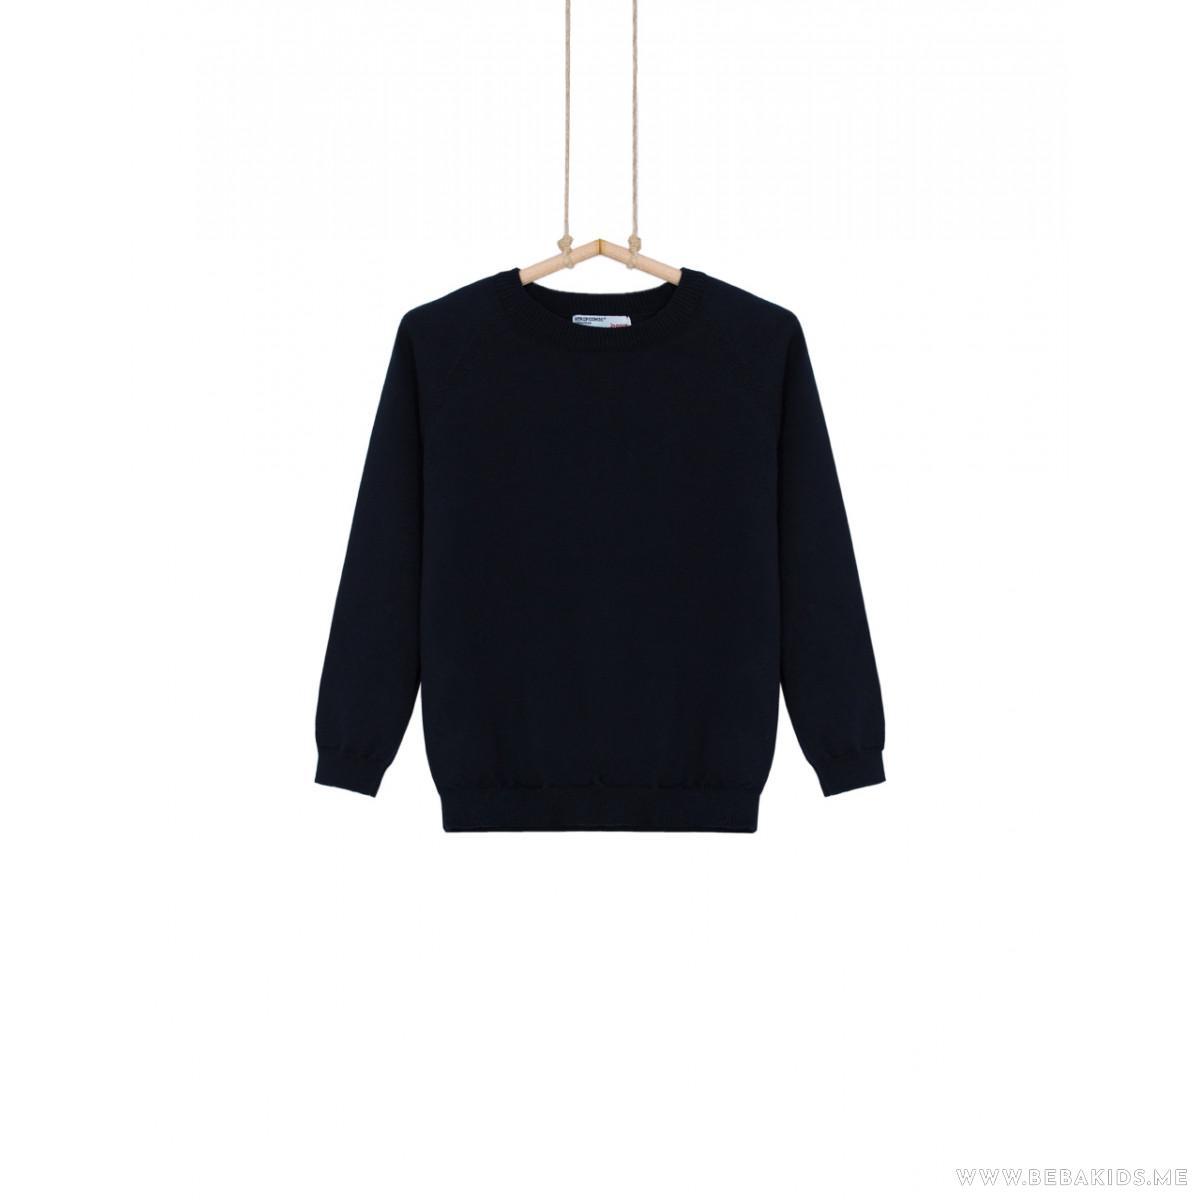 Džemper Basic M. jz 19